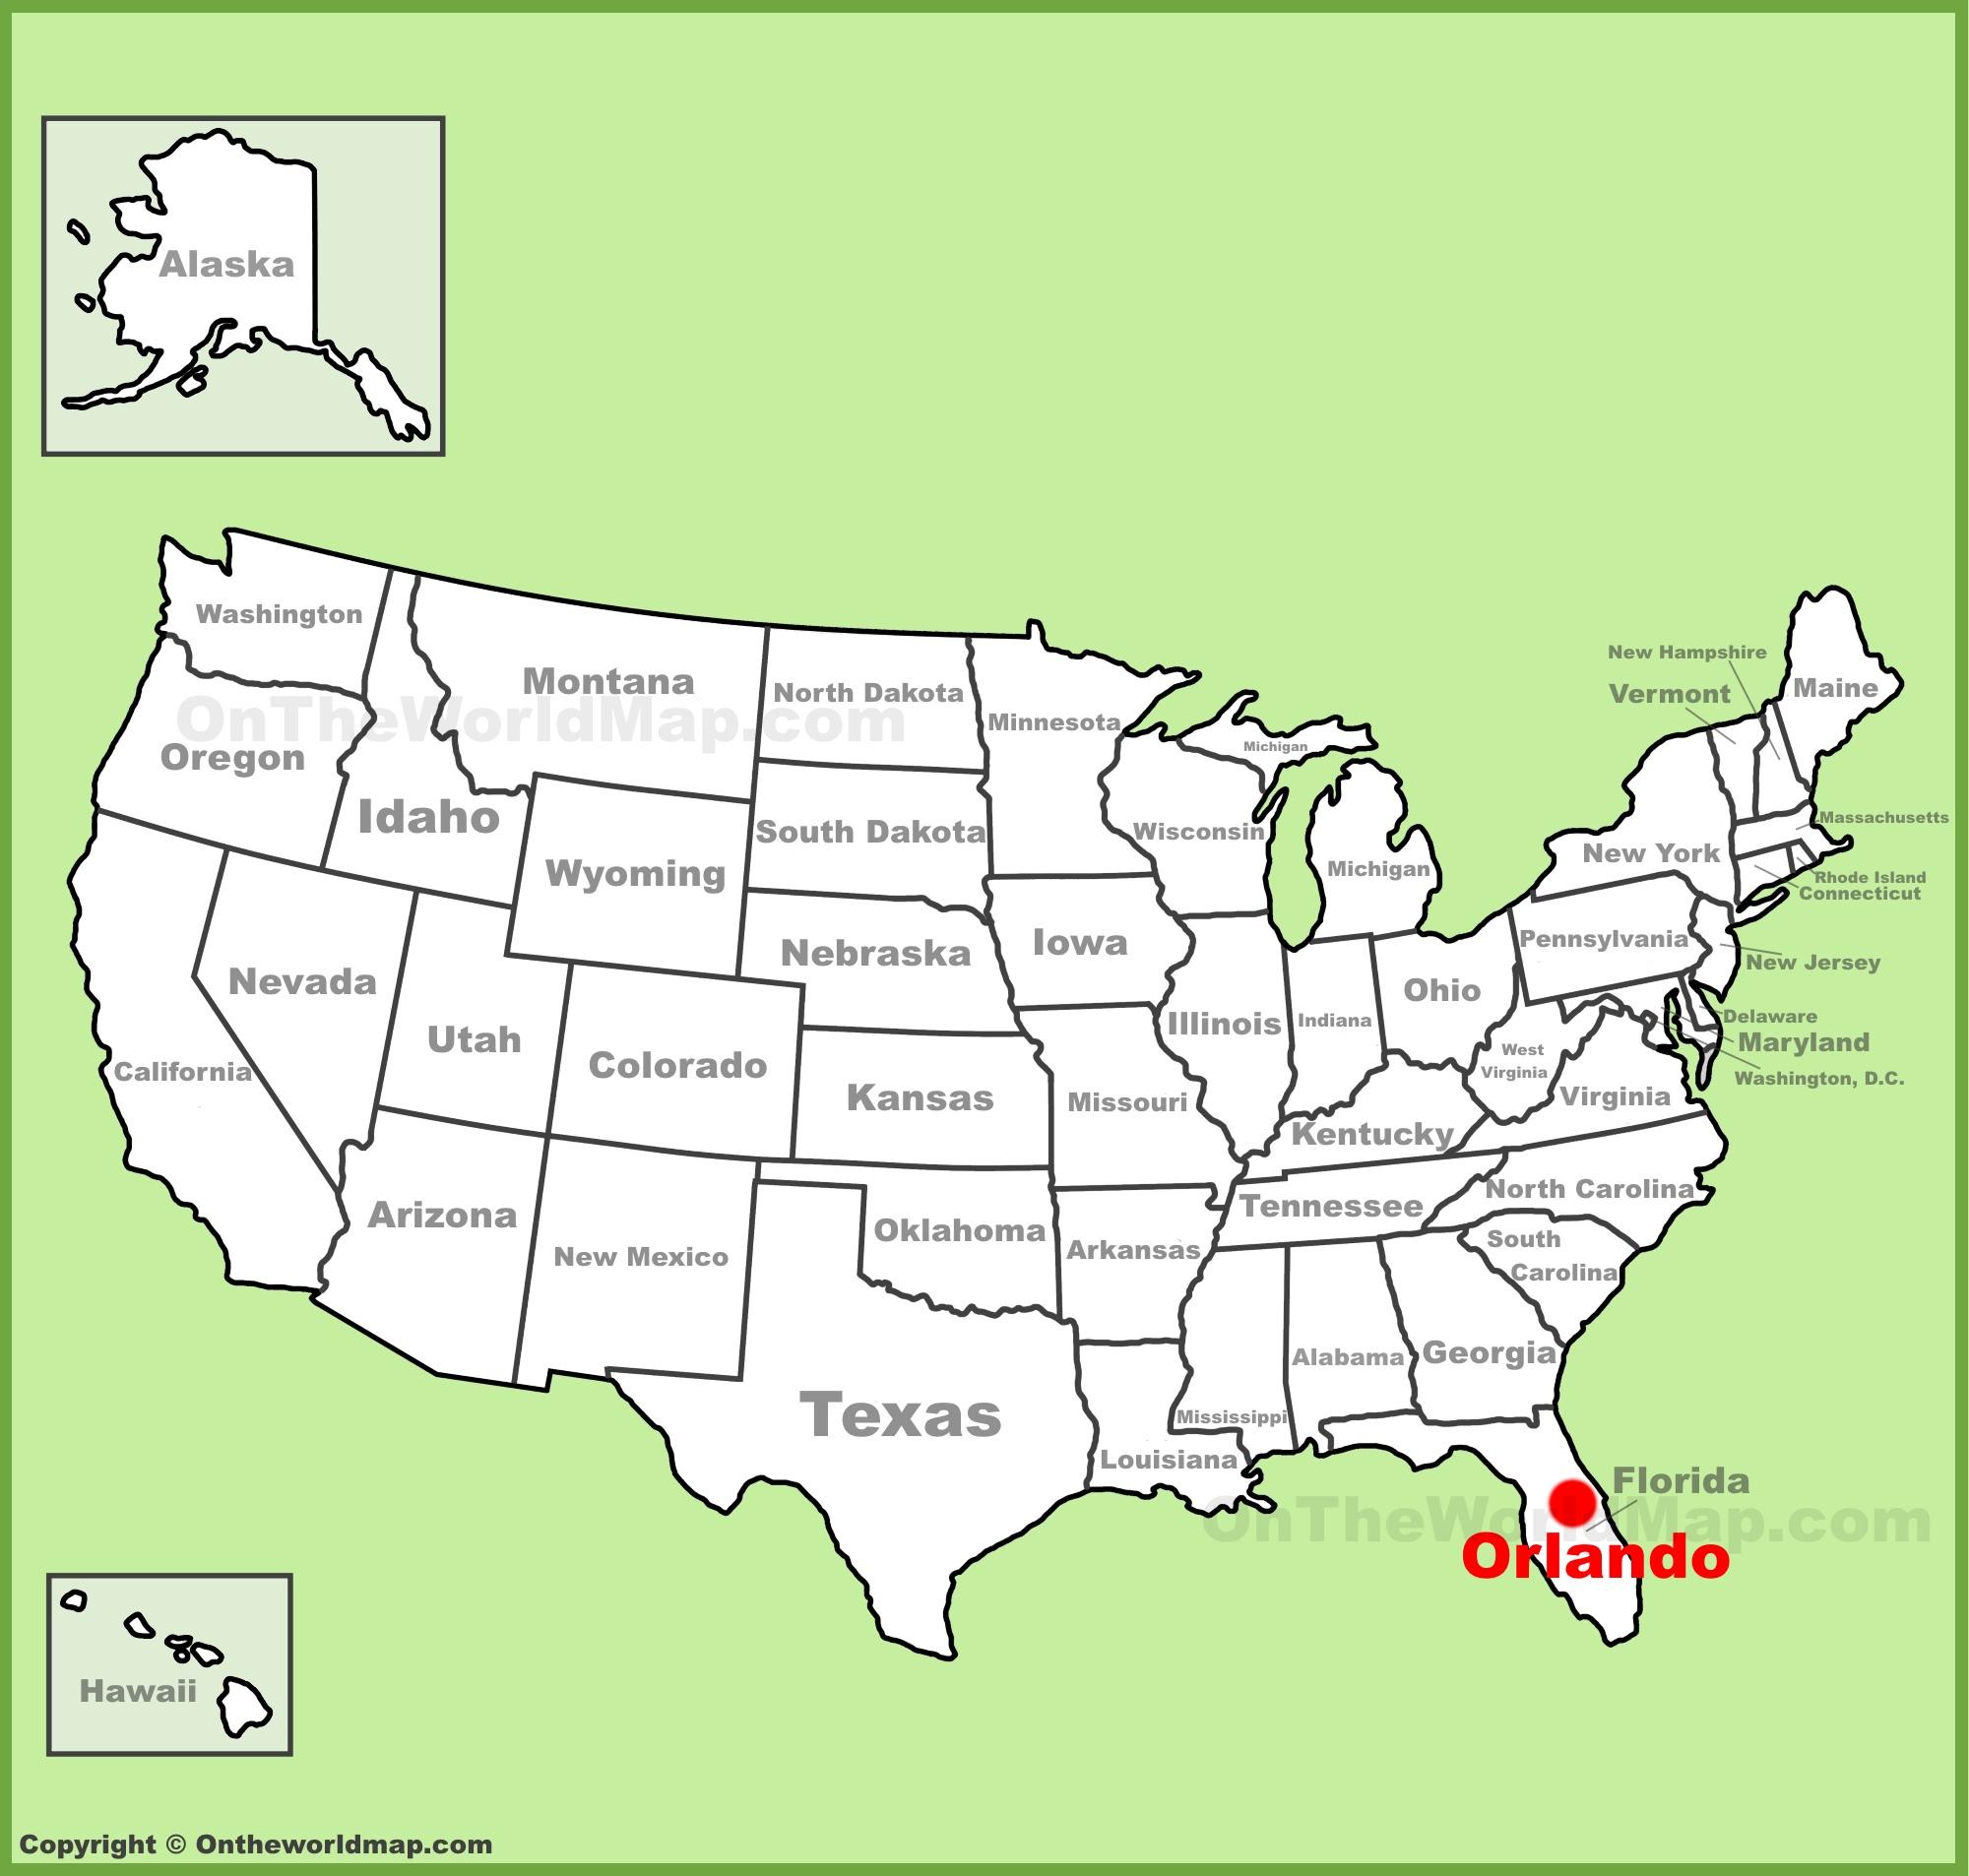 Orlando Florida Map Orlando location on the U.S. Map Orlando Florida Map